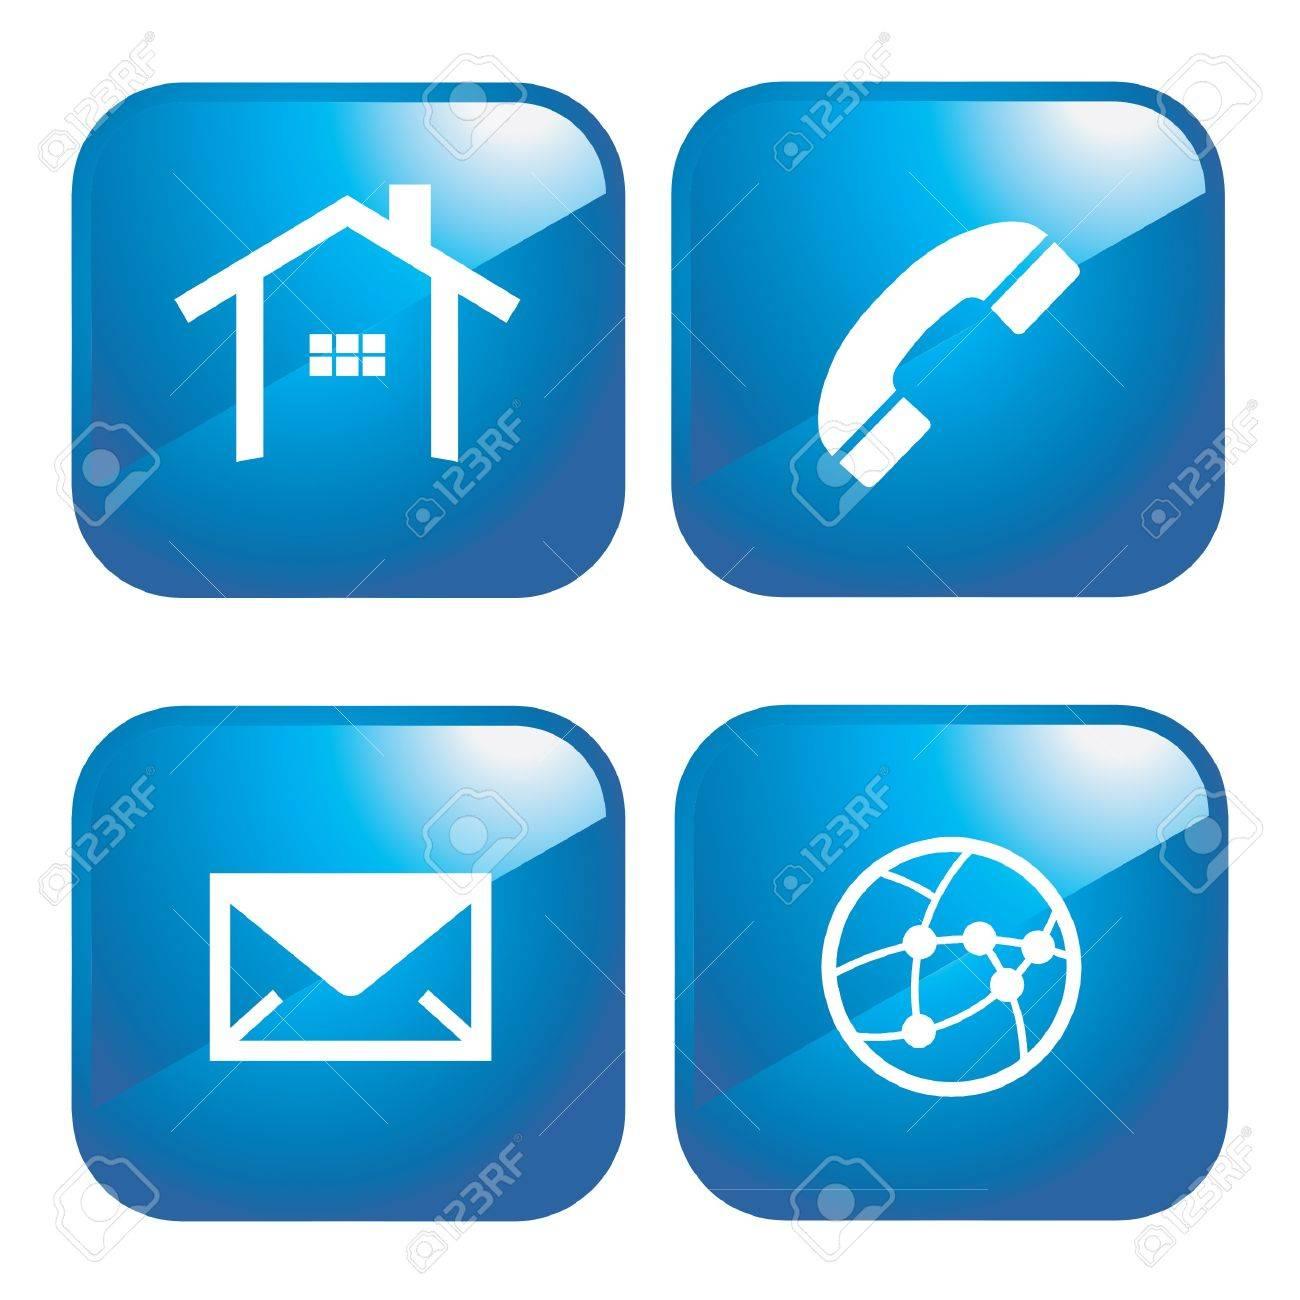 Internet web 20 icons royalty free cliparts vectors and stock internet web 20 icons stock vector 9757930 sciox Choice Image